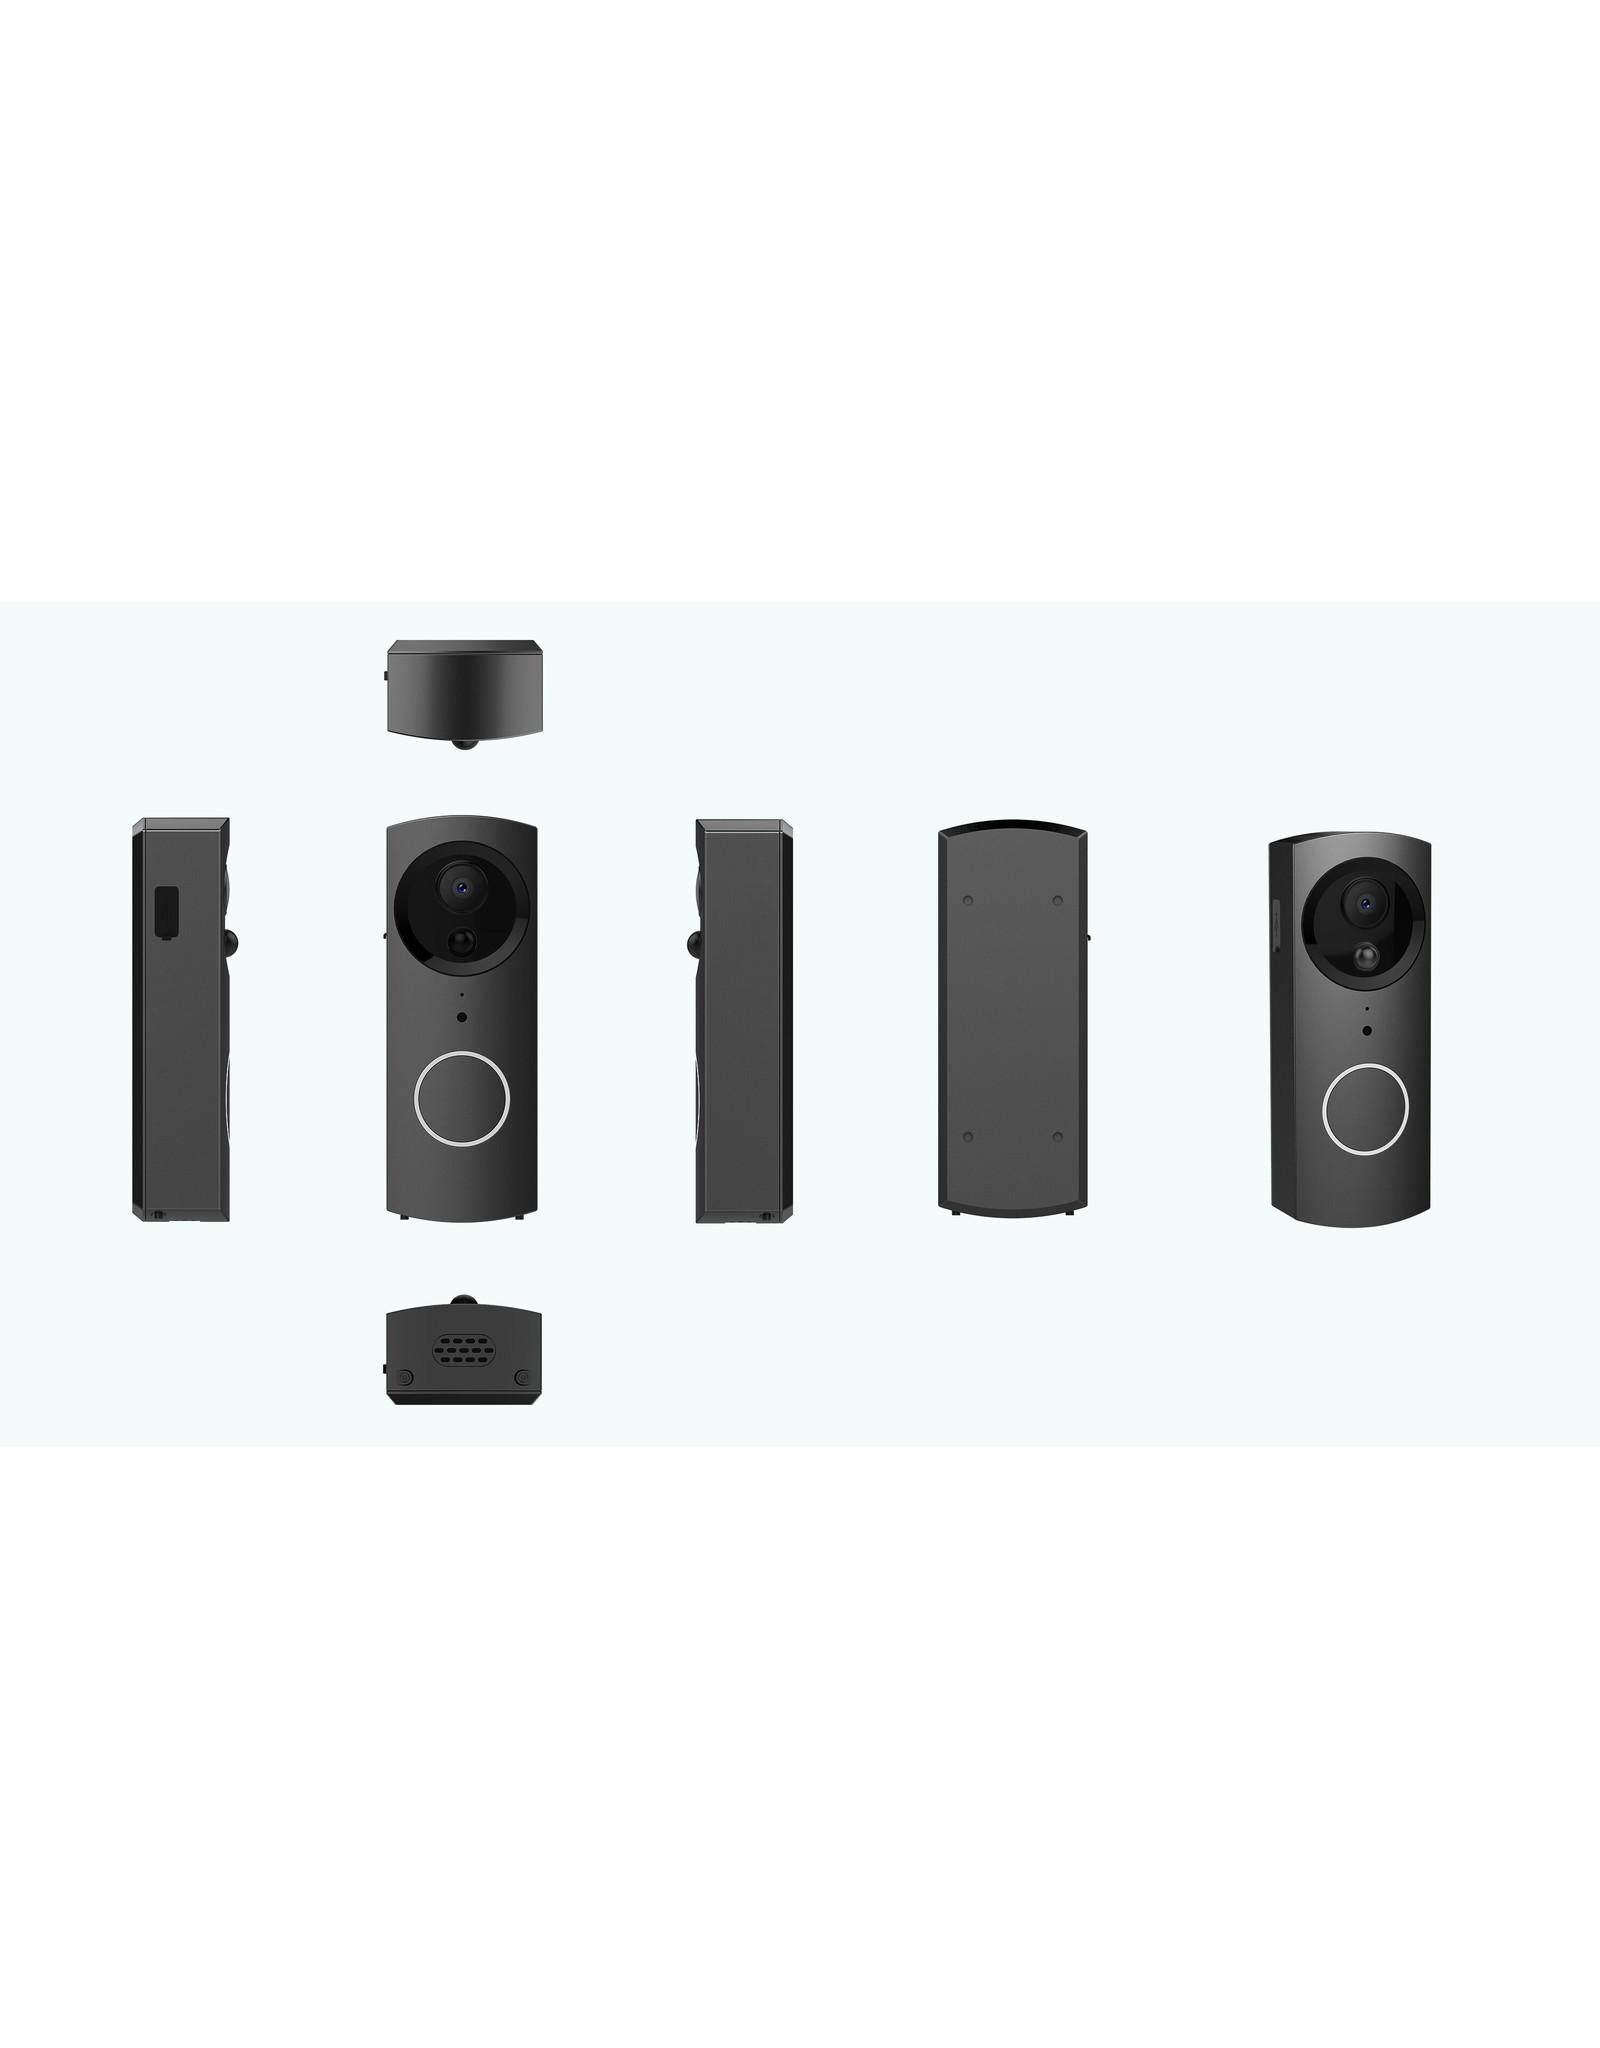 Woox Home Woox Smart WiFi Video Doorbell & Chime   R9061